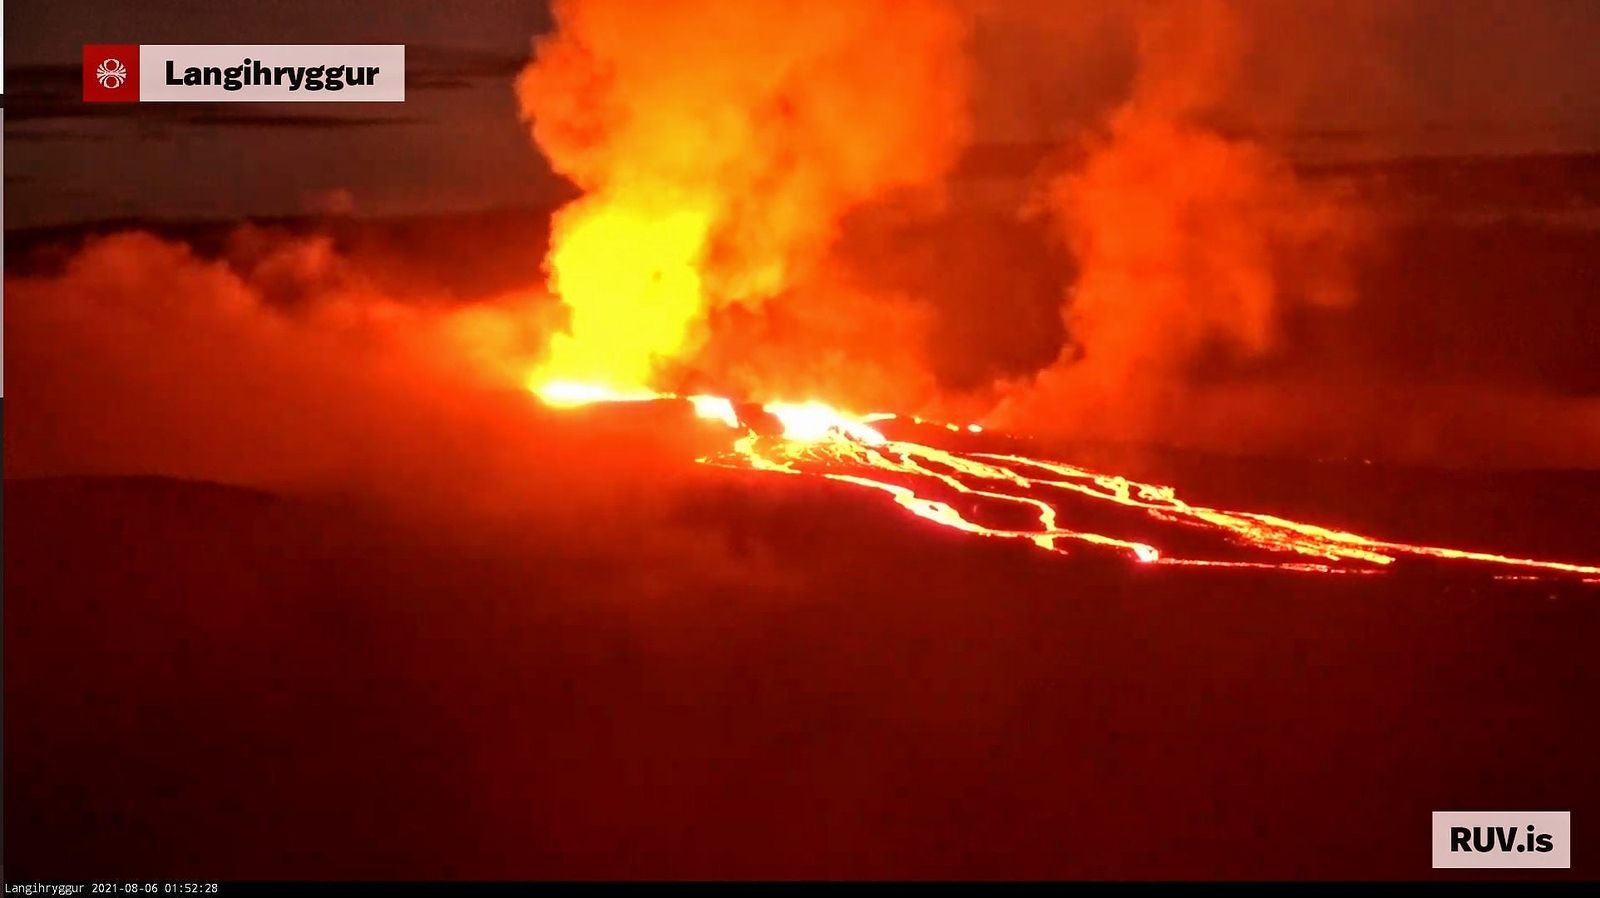 Fagradslasfjall - coulées du 06.08.2021 / 01h52 - webcam langihryggur NV / RUV - un clic pour agrandir